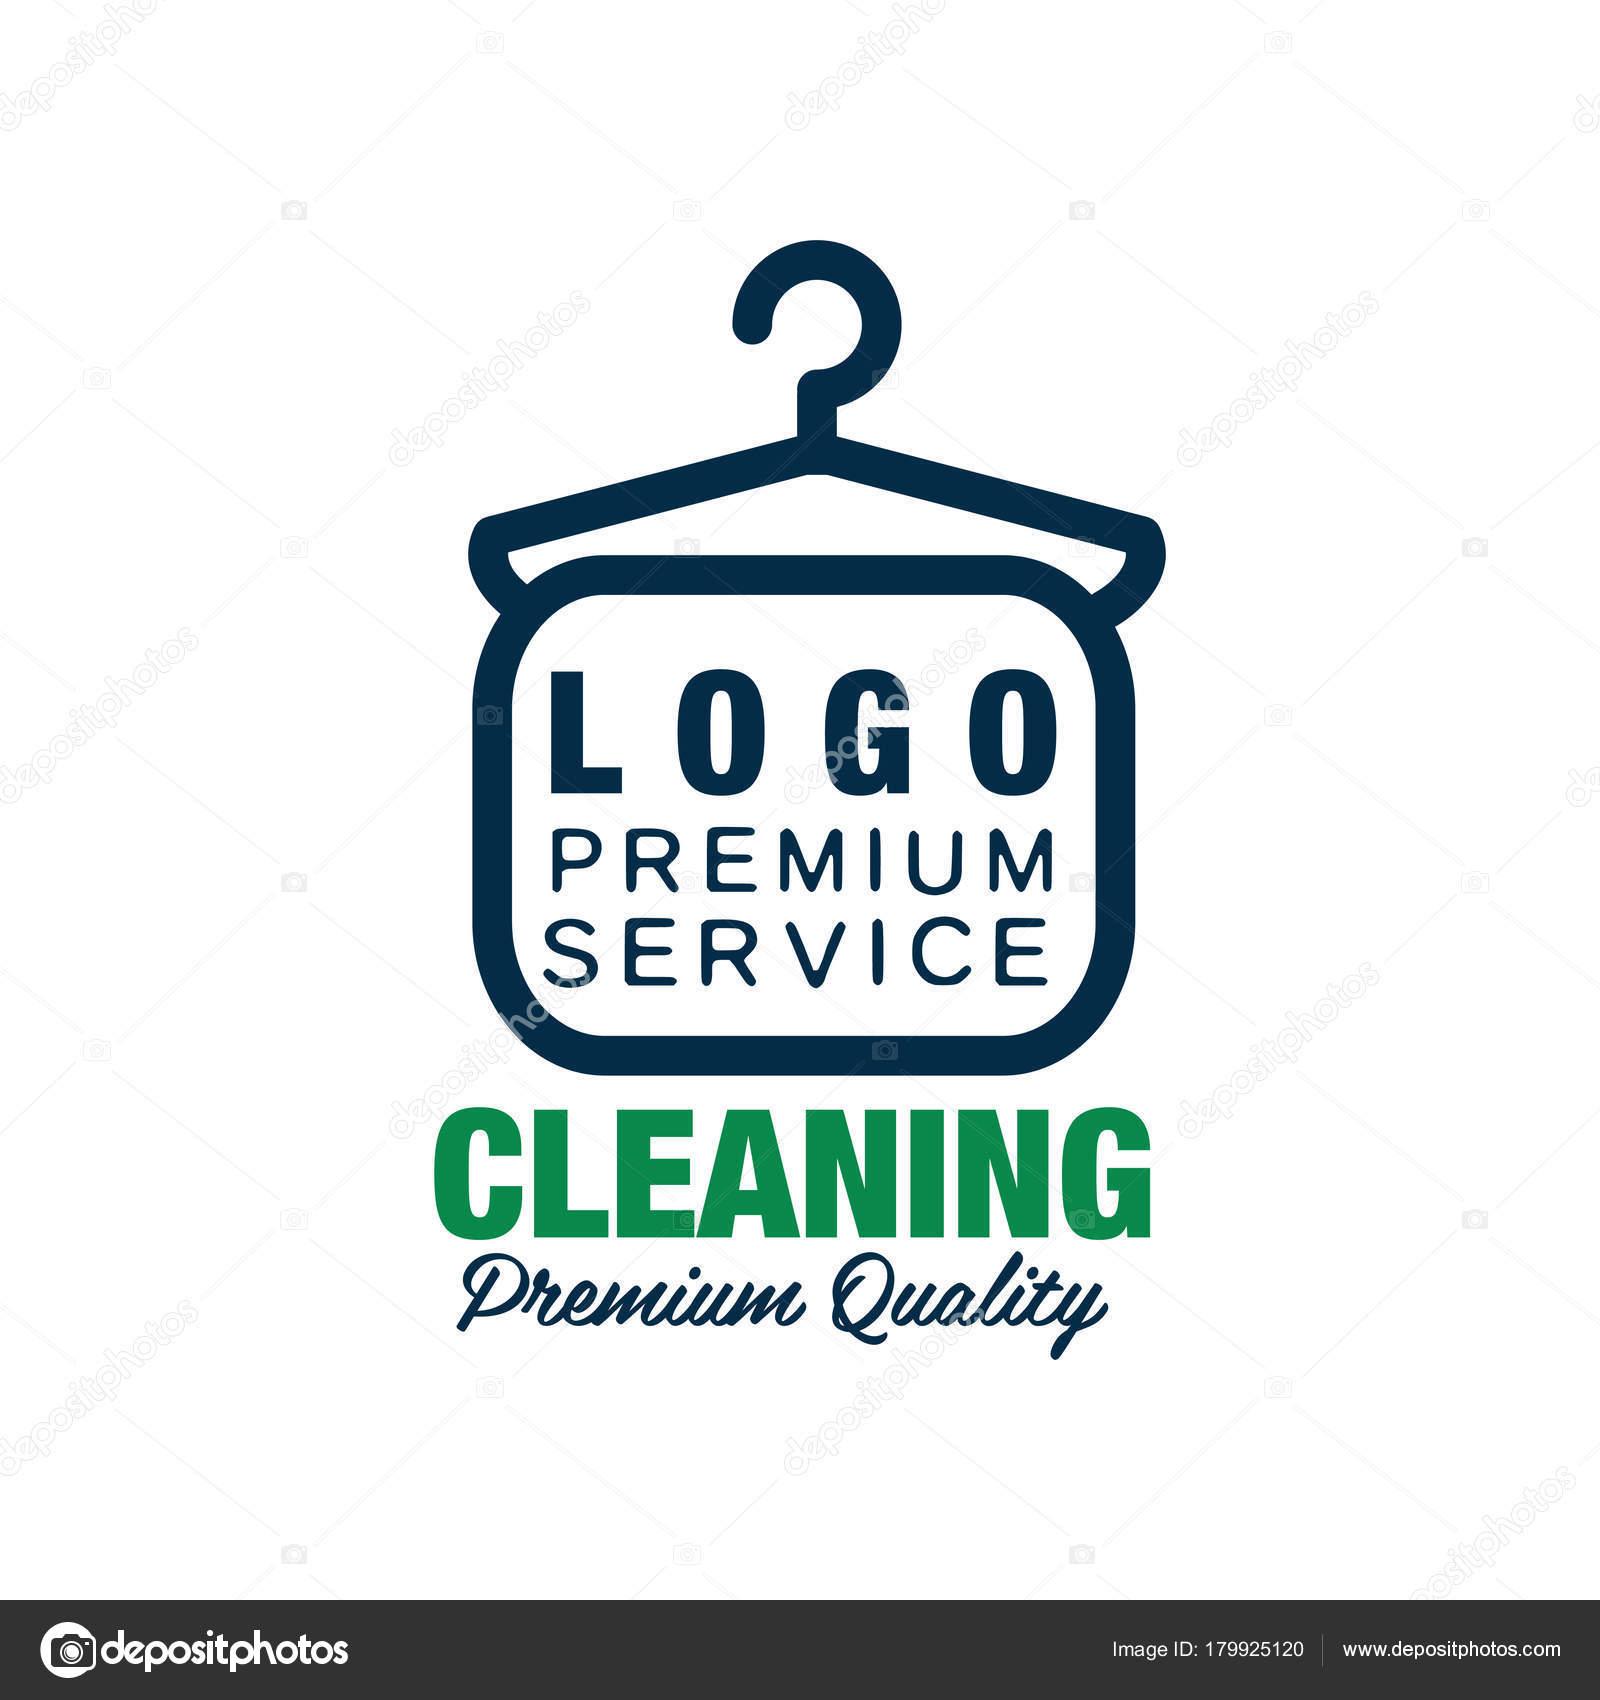 Creative logo for dry cleaning or laundry service clothes hanger creative logo for dry cleaning or laundry service clothes hanger symbol in line style buycottarizona Choice Image